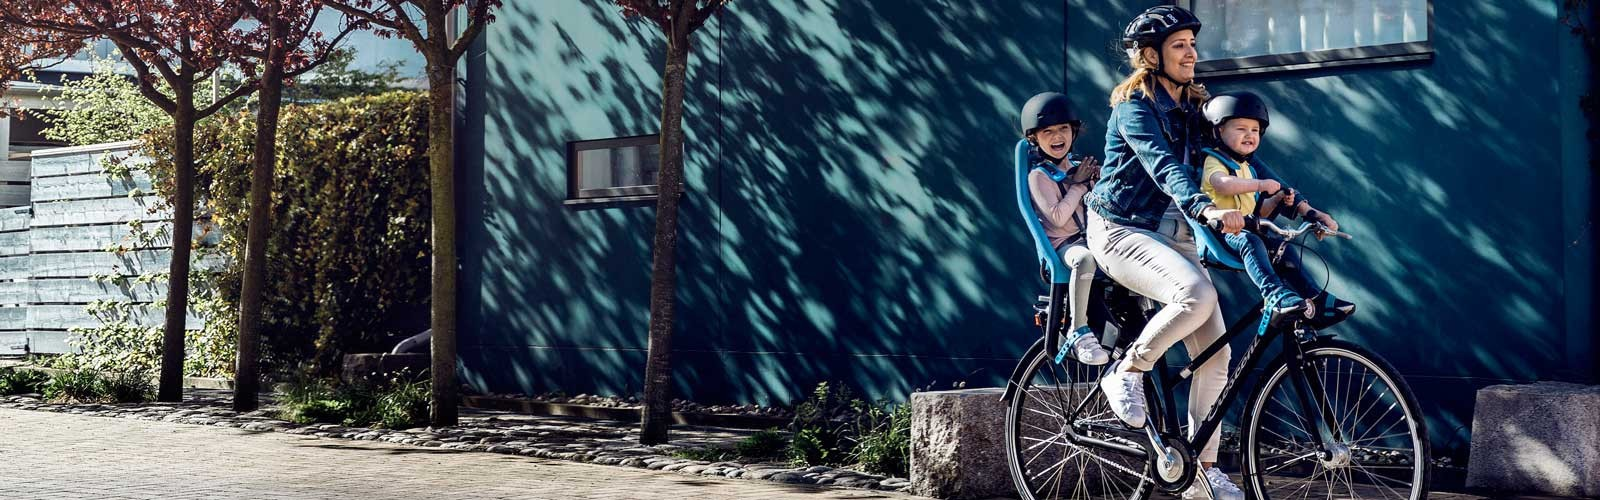 Siège vélo enfant